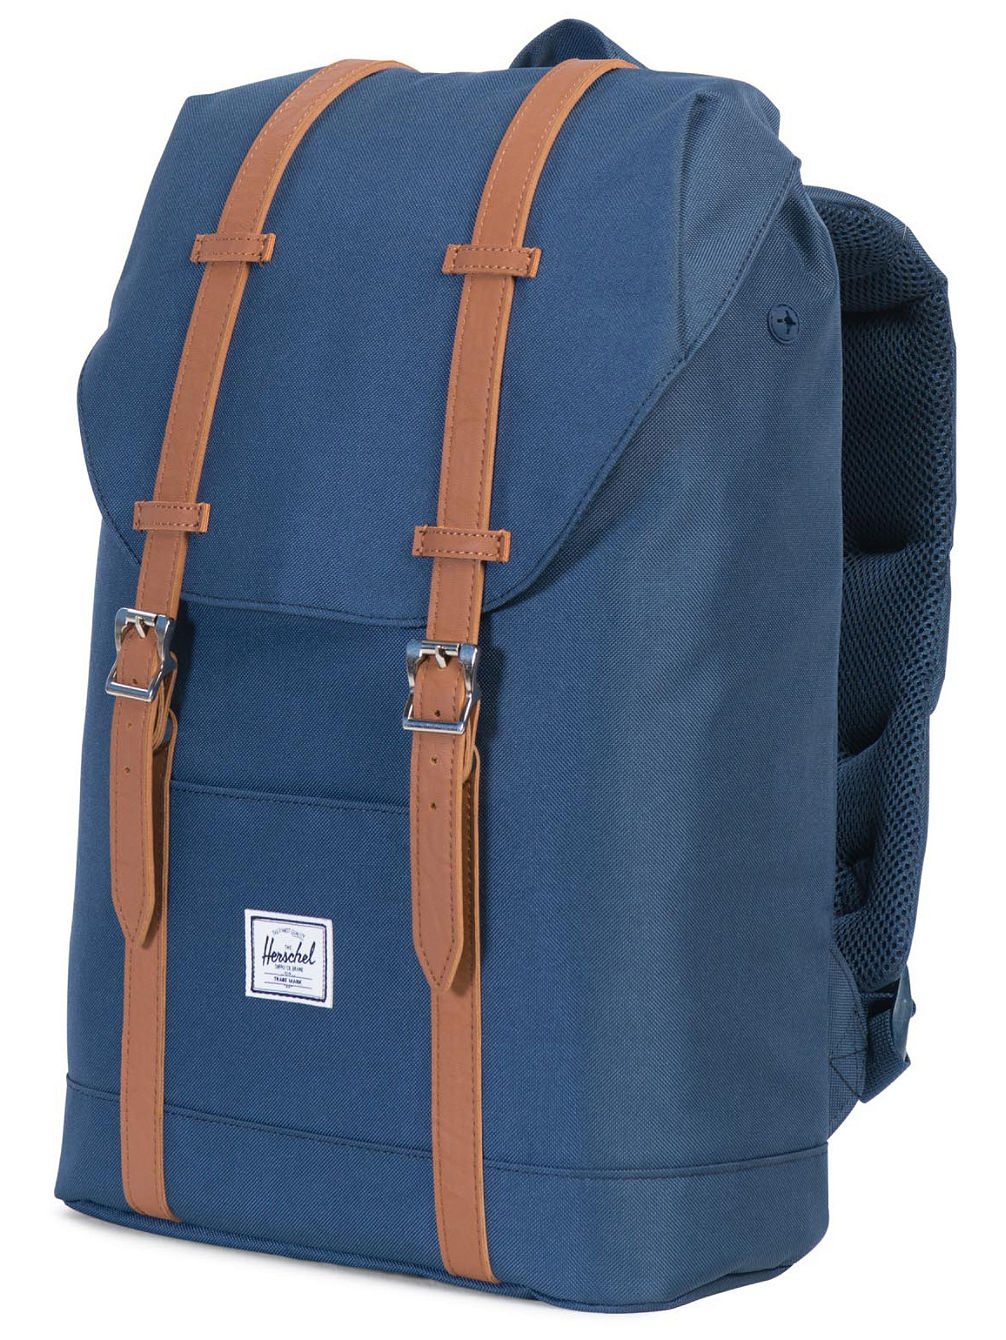 Buy Herschel Retreat Mid-Volume Backpack online at blue-tomato.com 7ccbbebc931c9